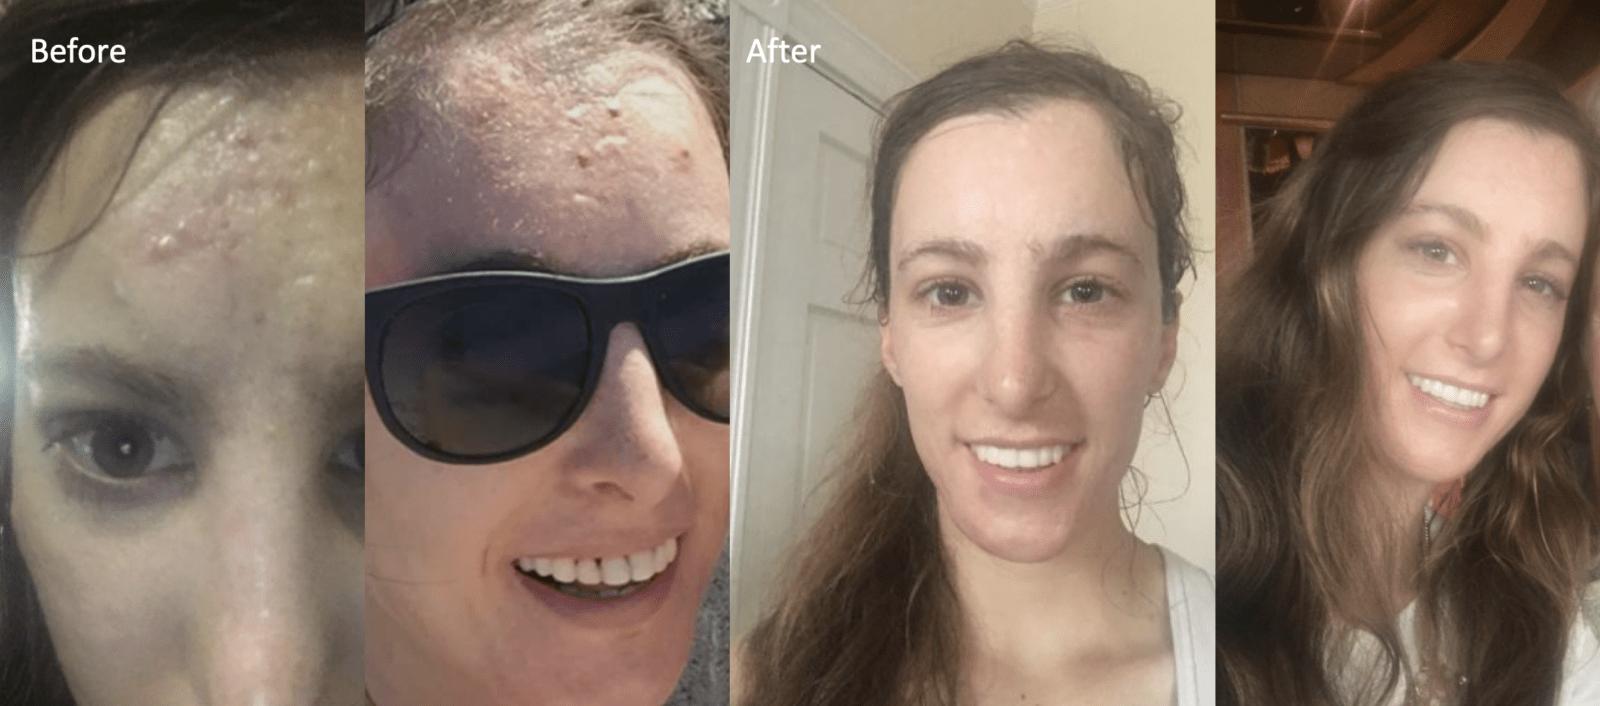 icepick acne scar healing